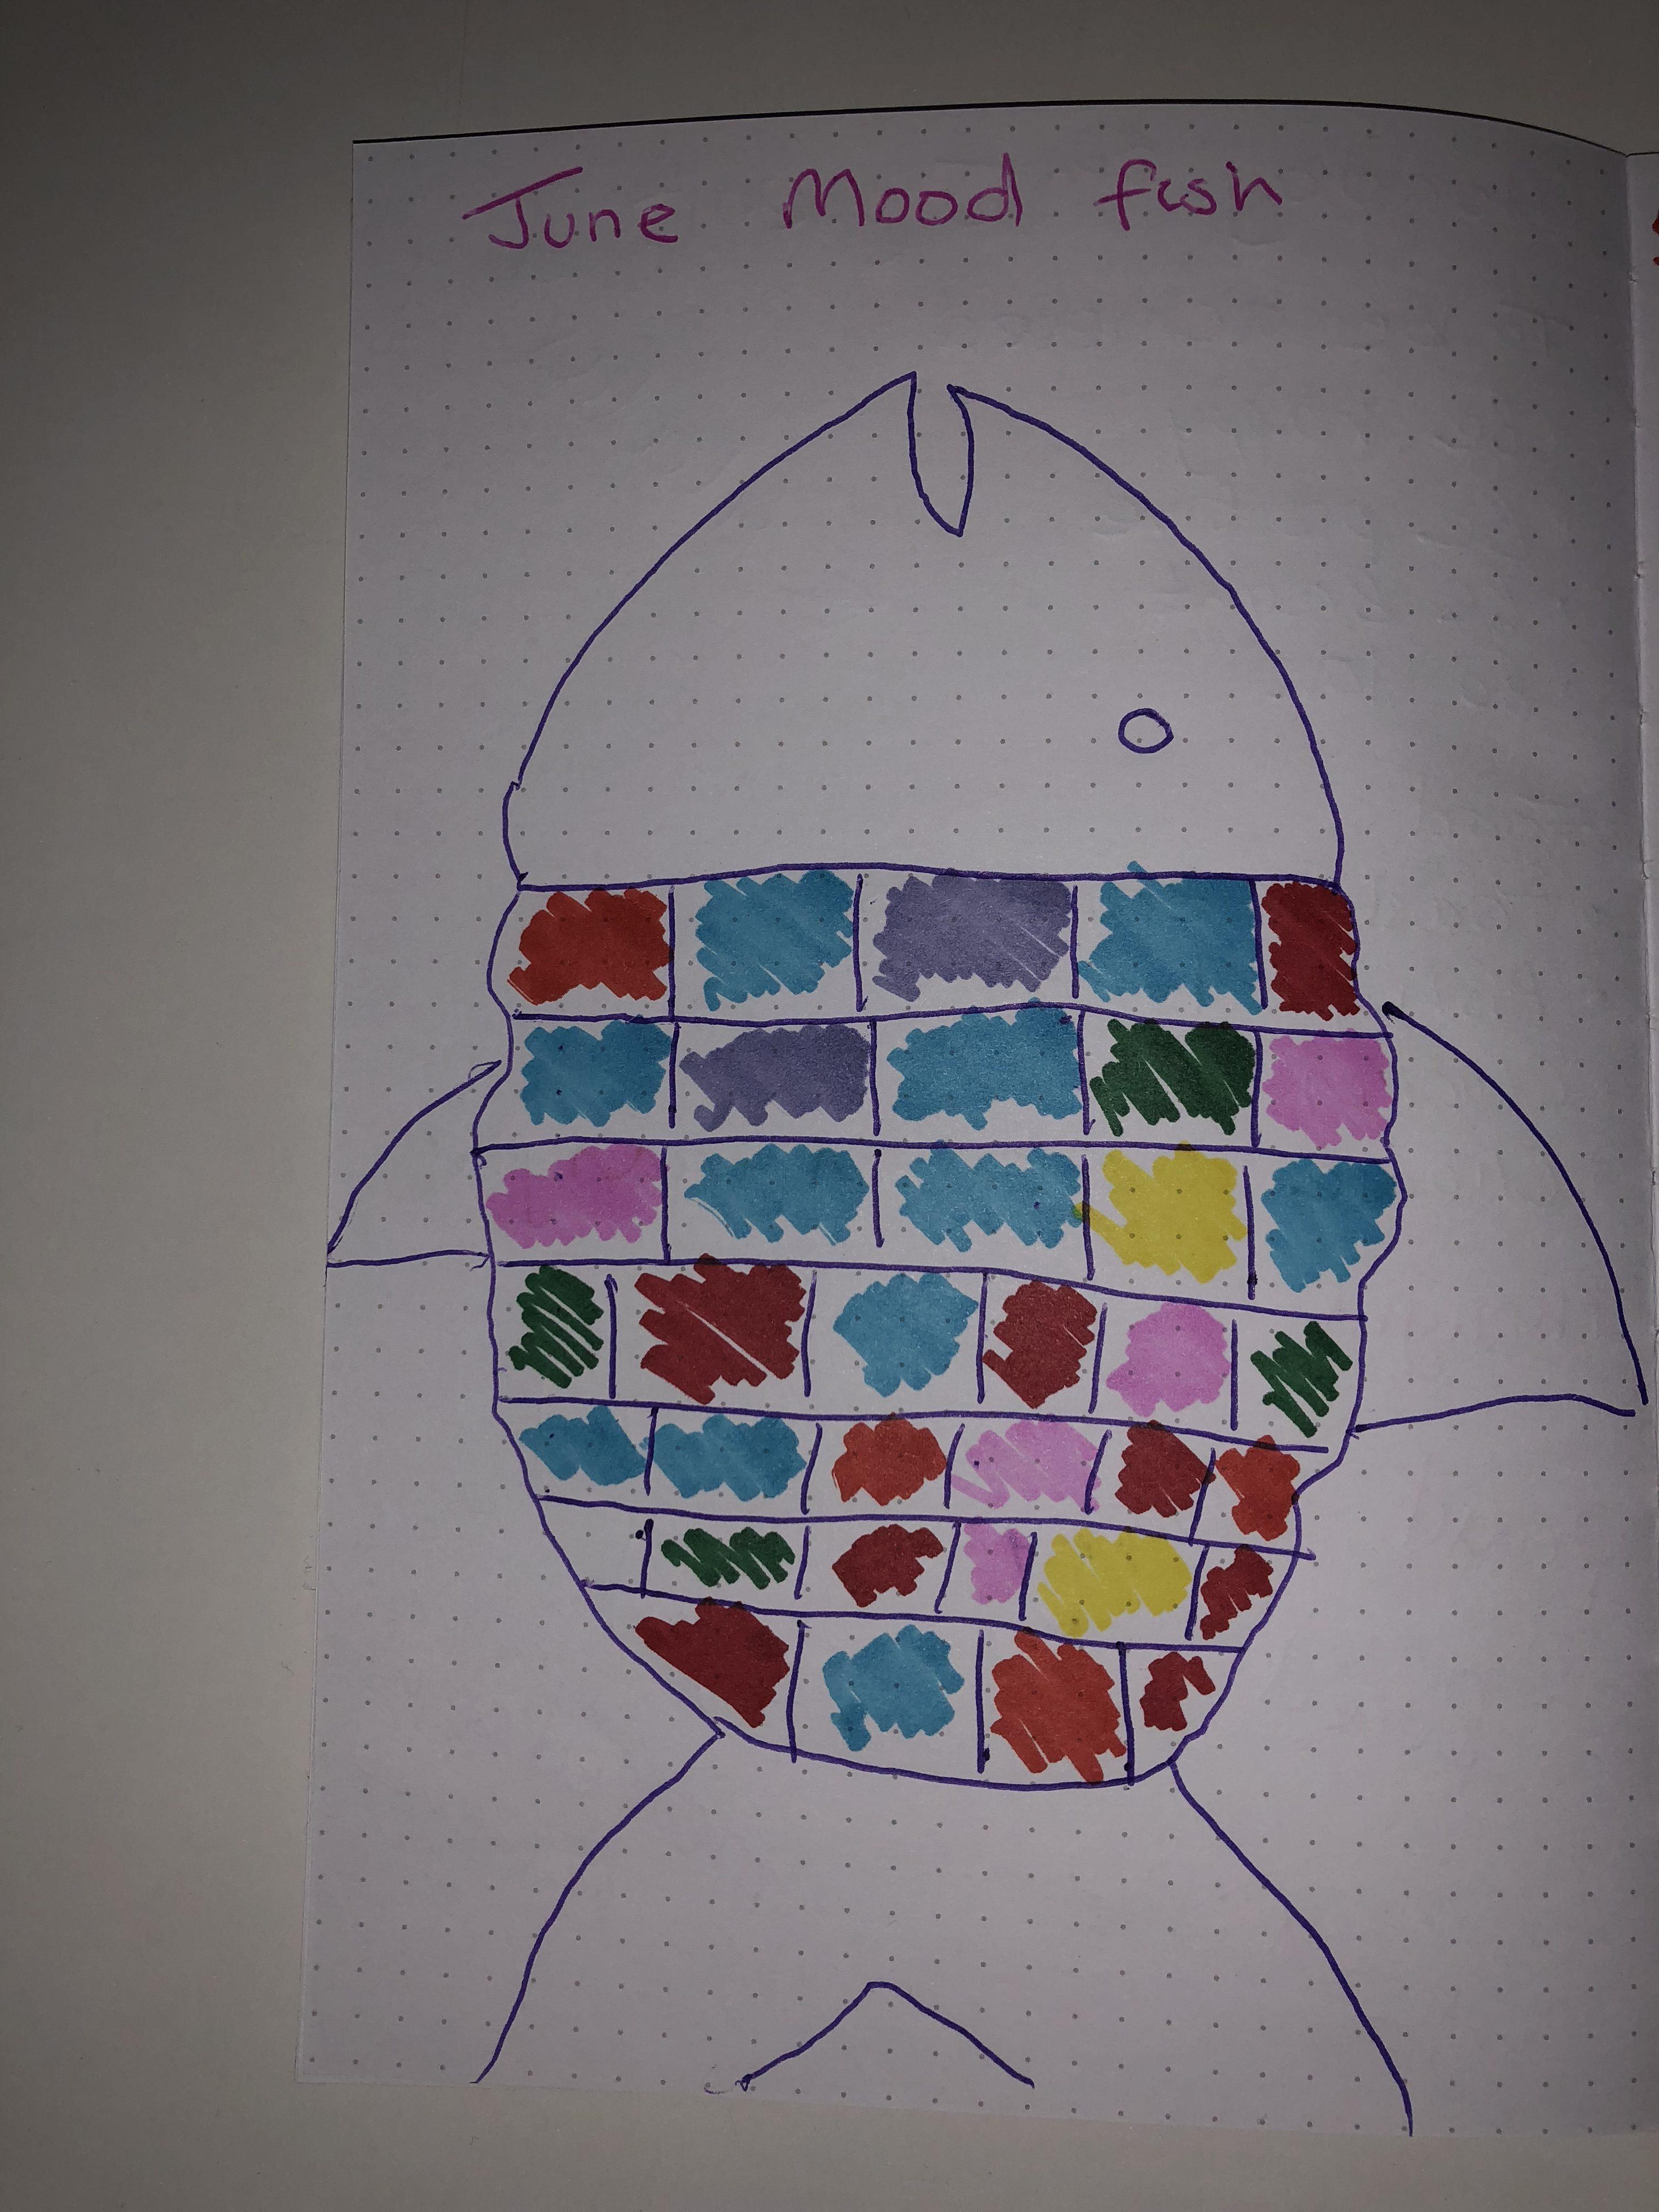 Mood Fish